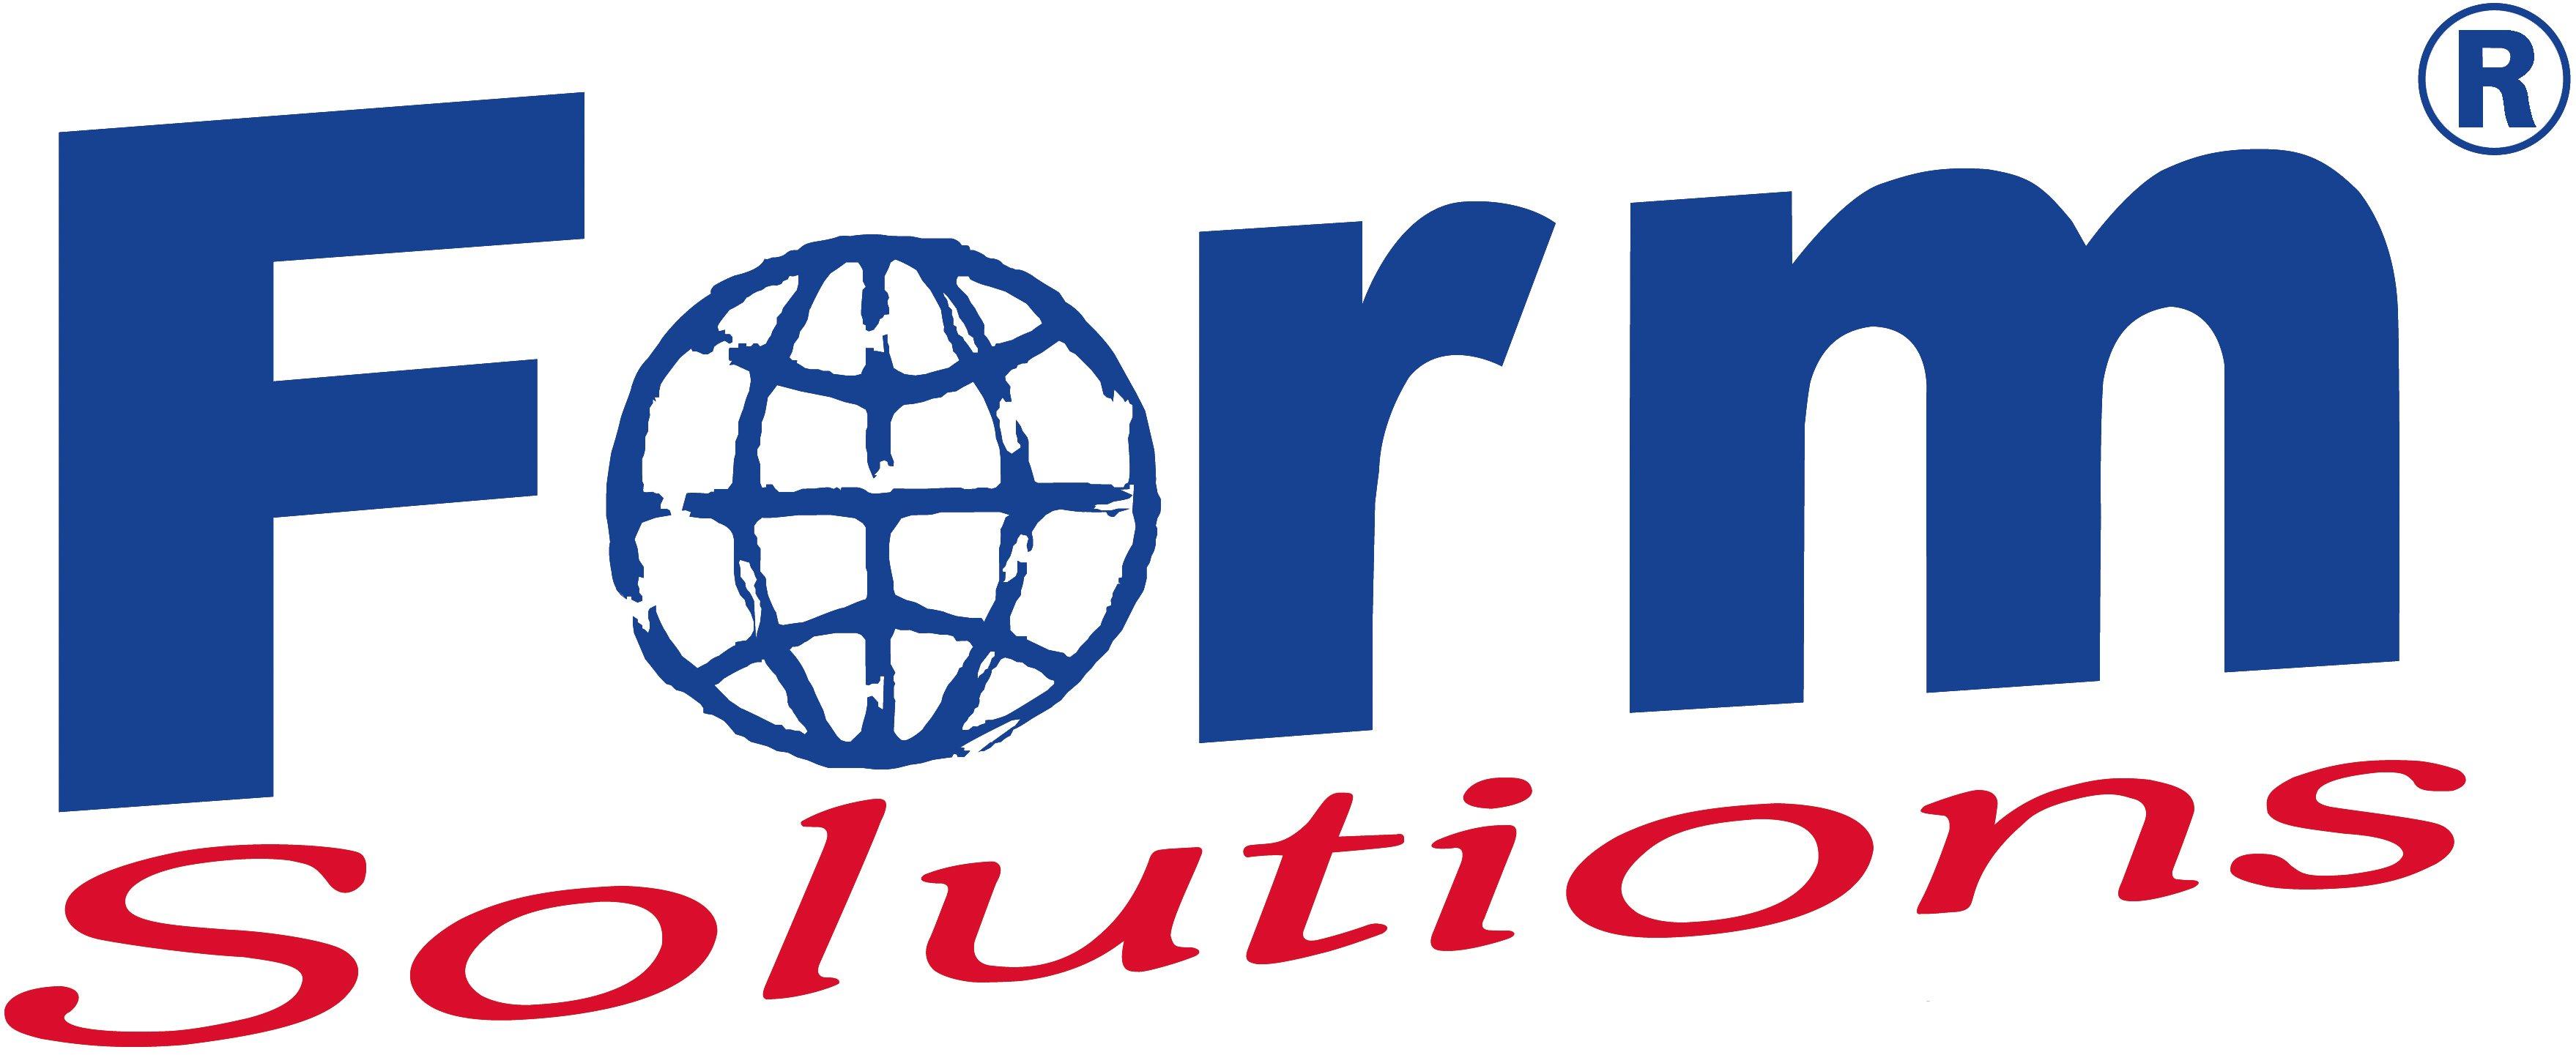 Form-solutions-Logo_horizontal_farbig_600dpi_cmyk-1